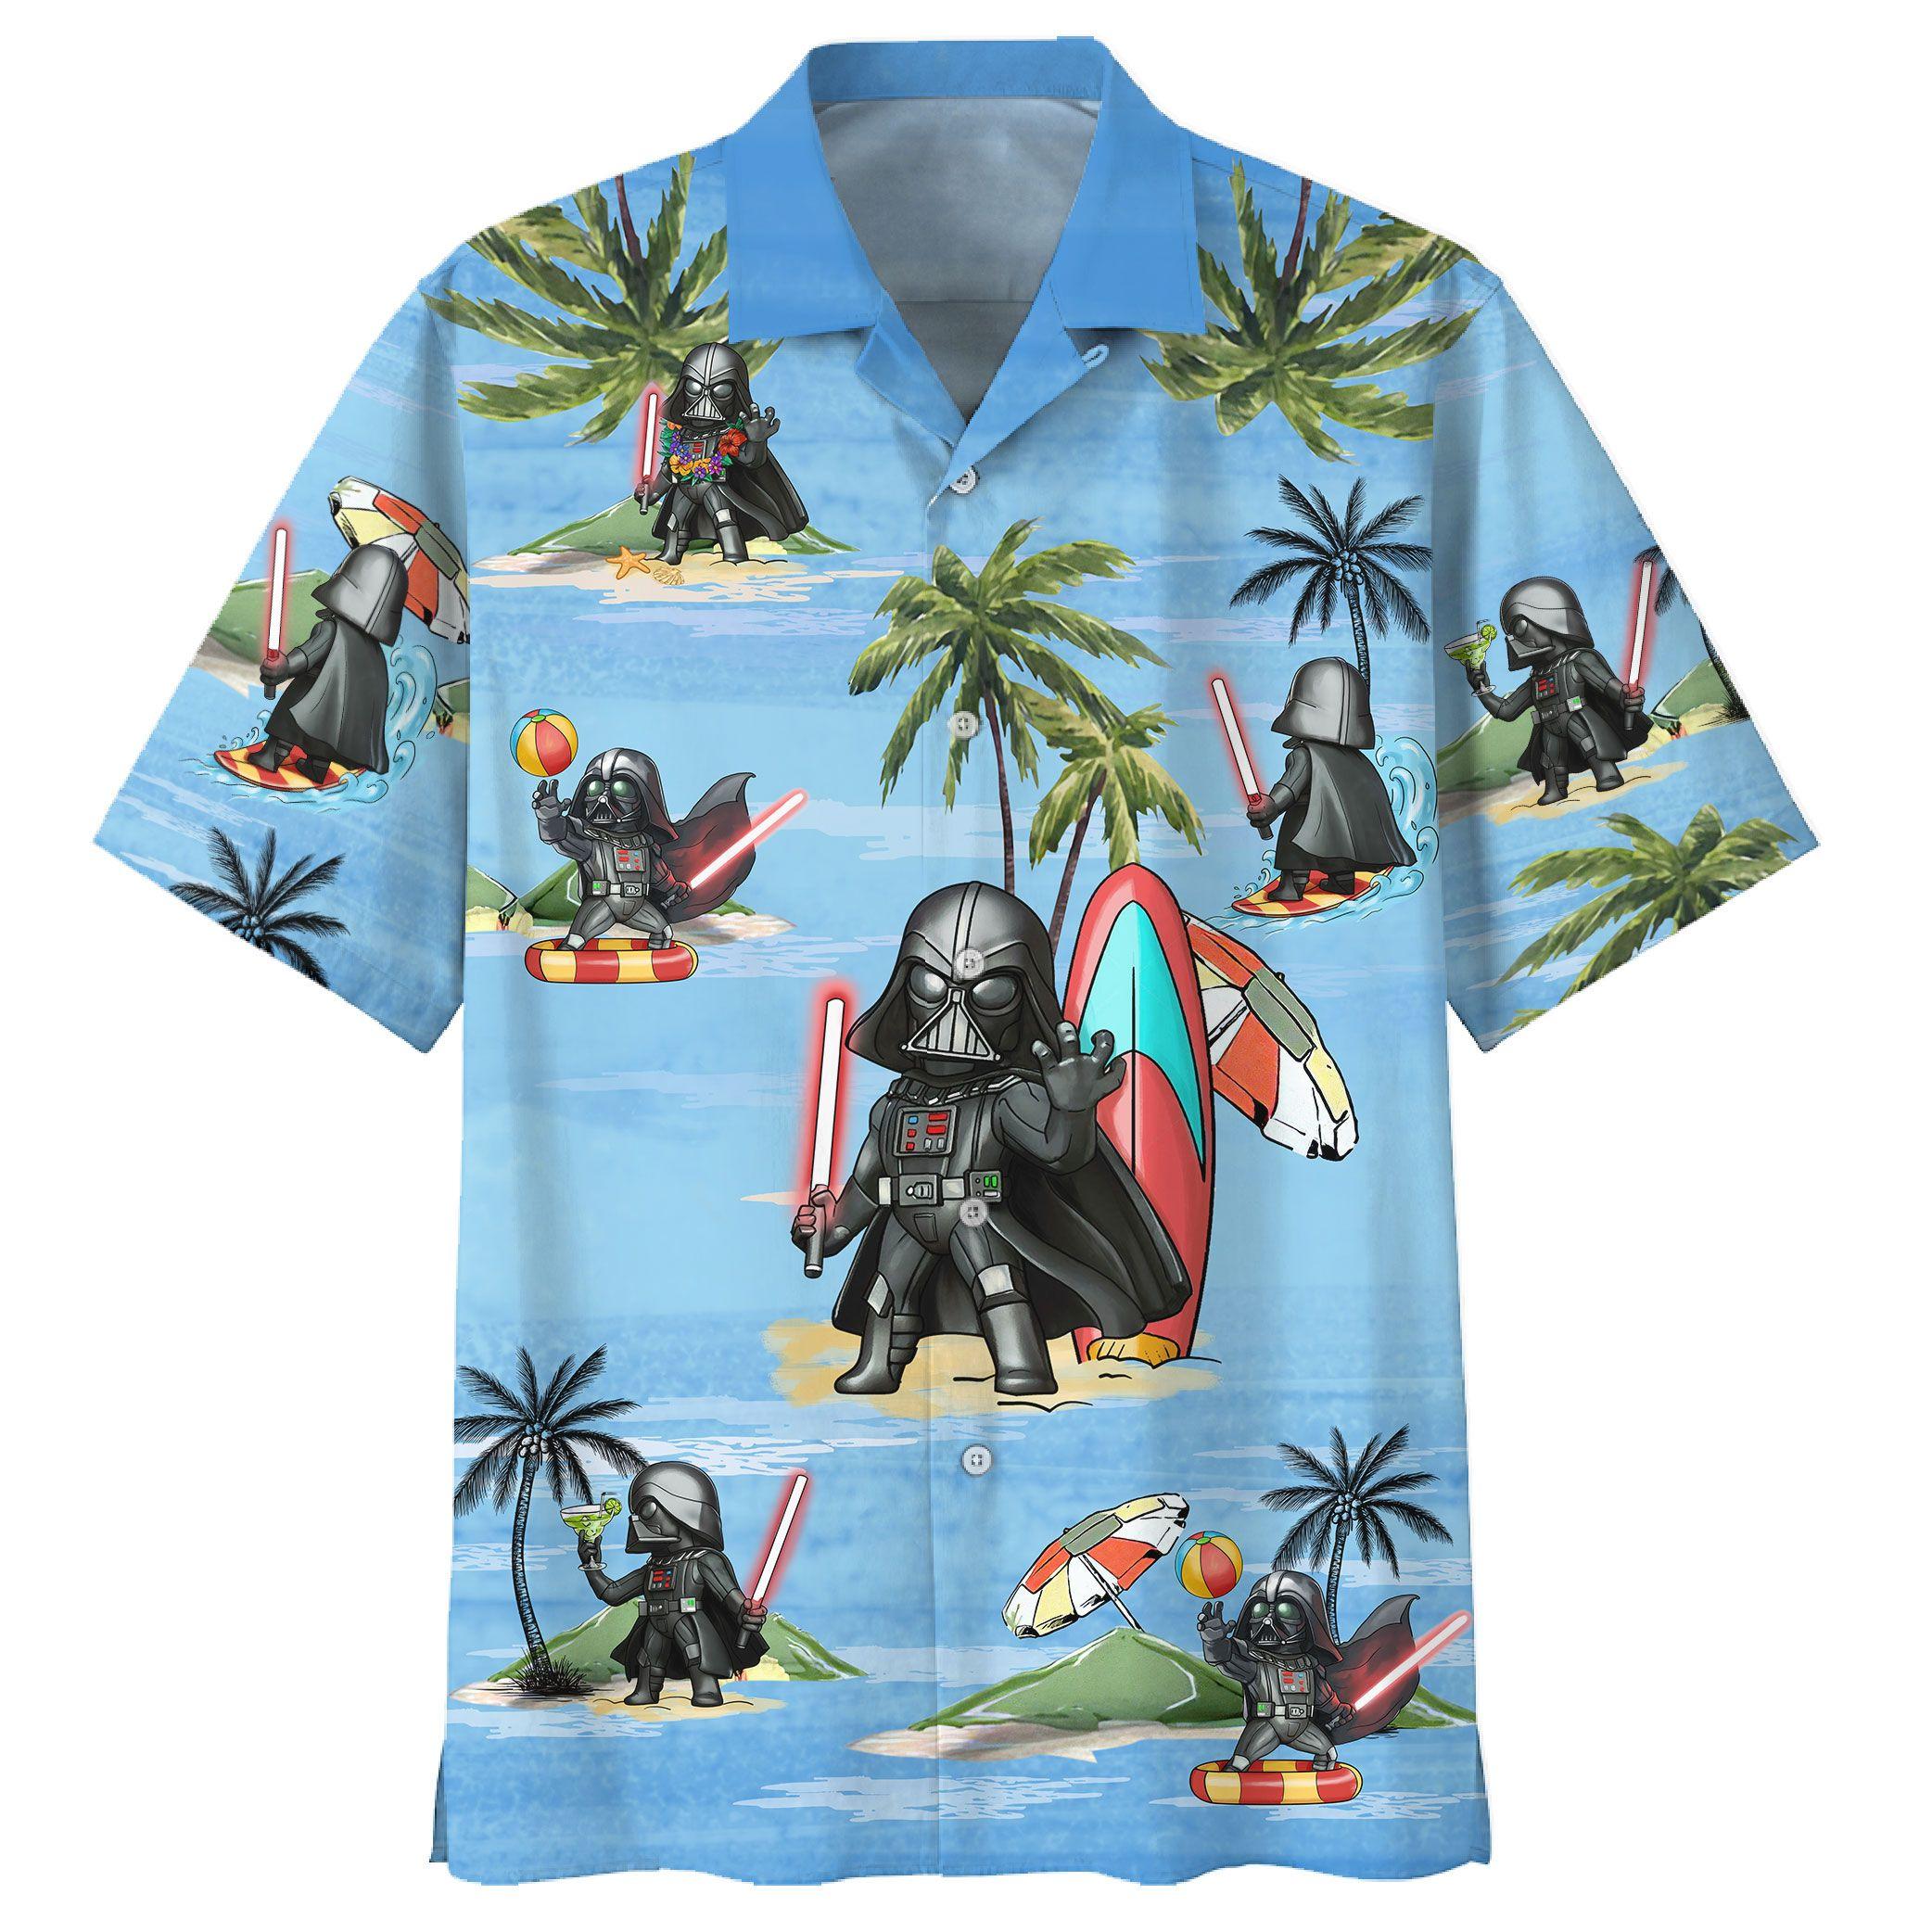 Darth Vader Summer Time Hawaiian Shirt